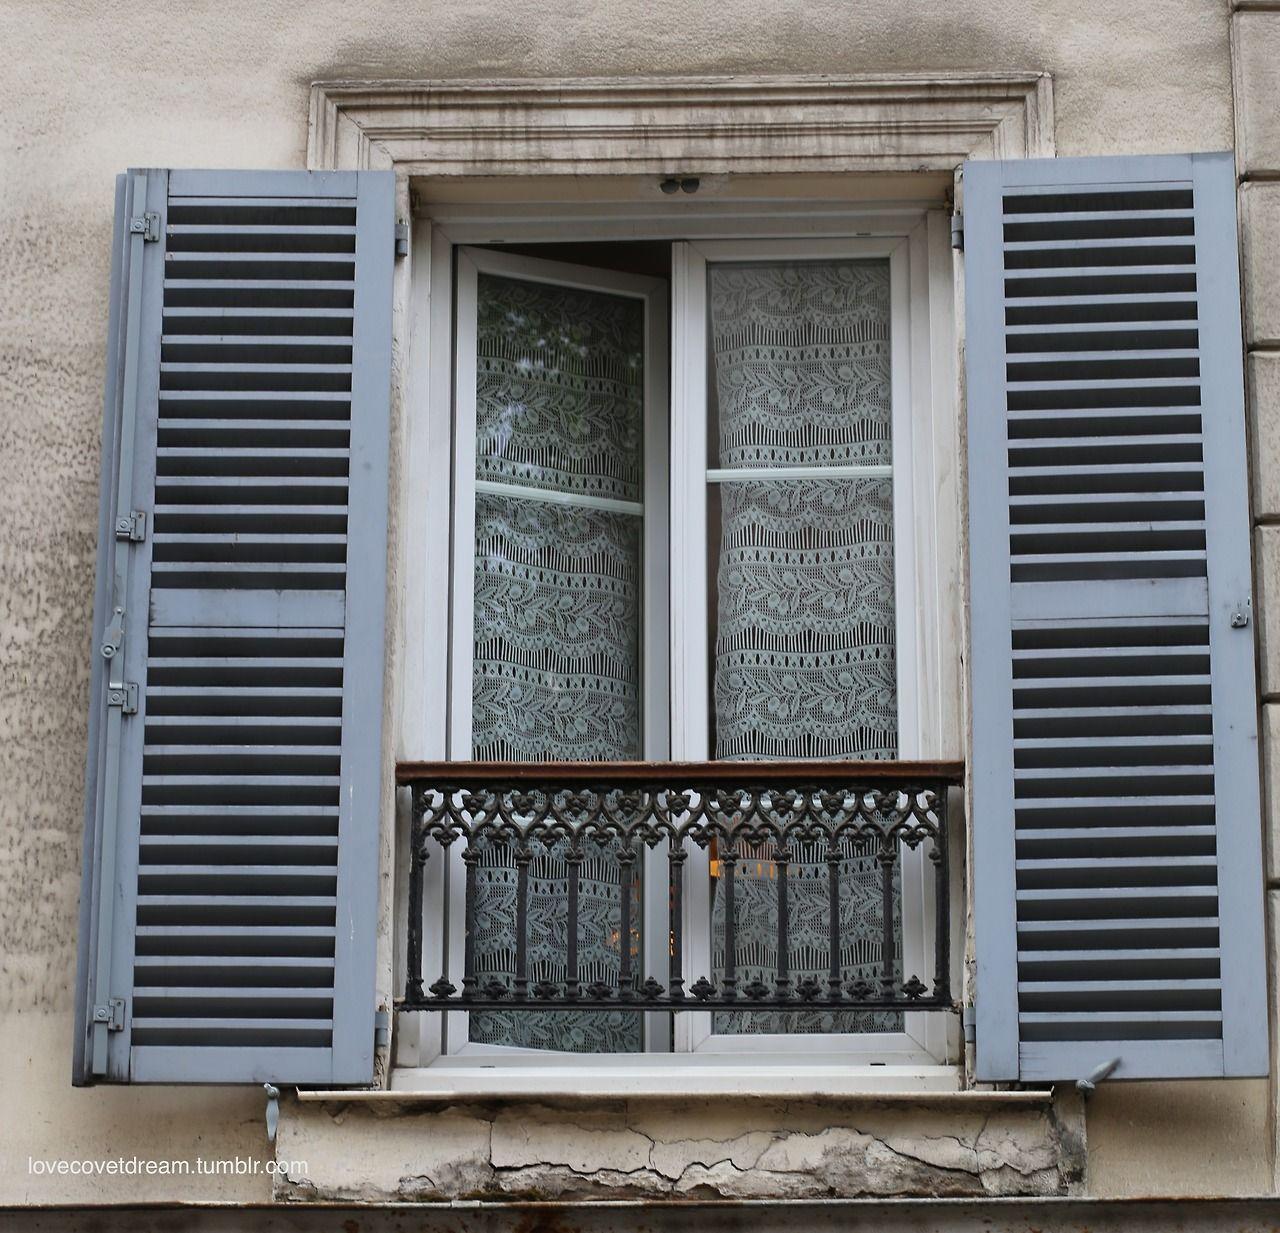 Parisian moments <3